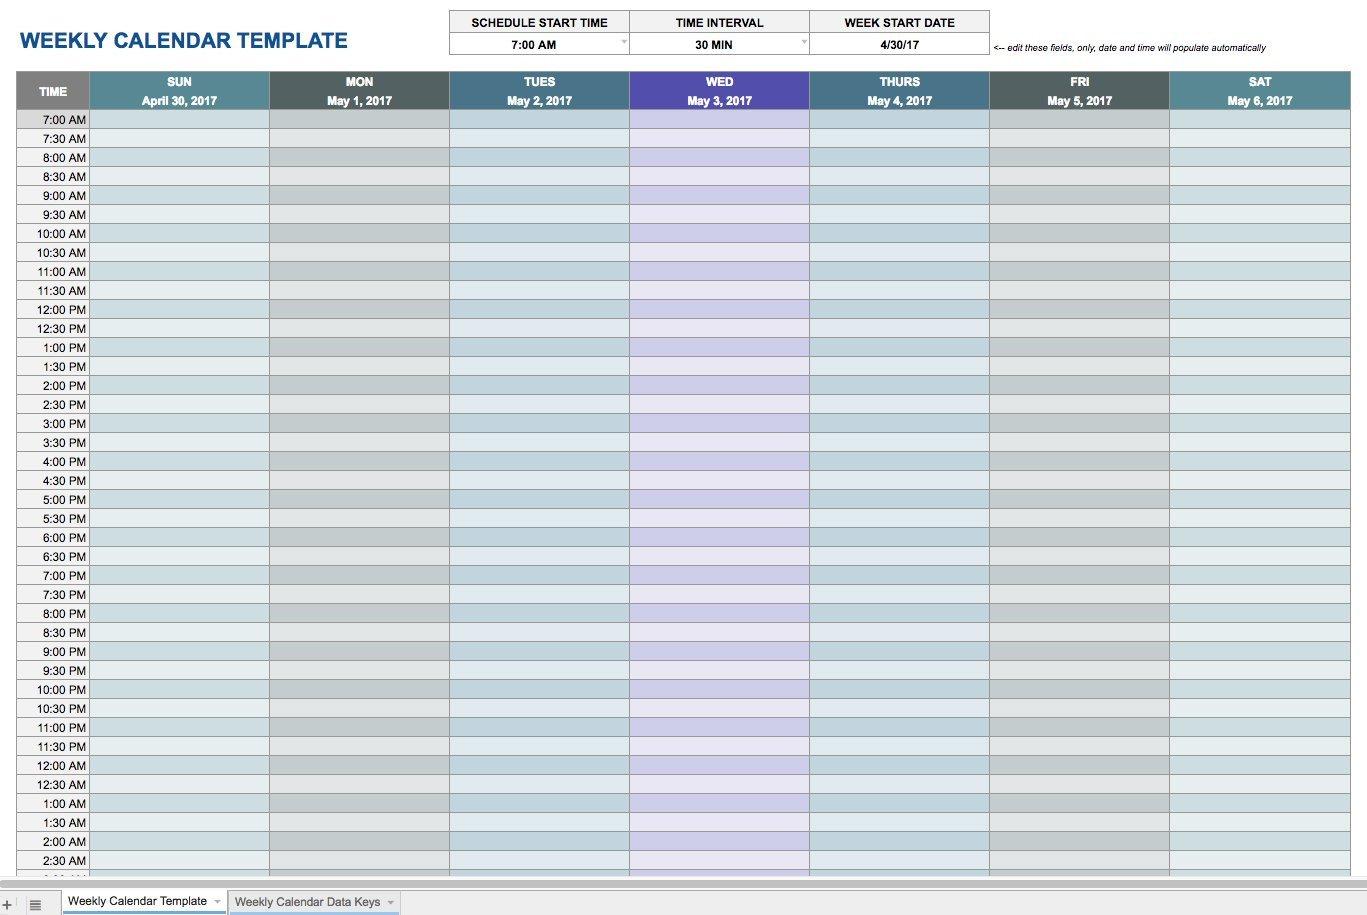 Google Sheets Inventory Template Free Google Docs and Spreadsheet Templates Smartsheet